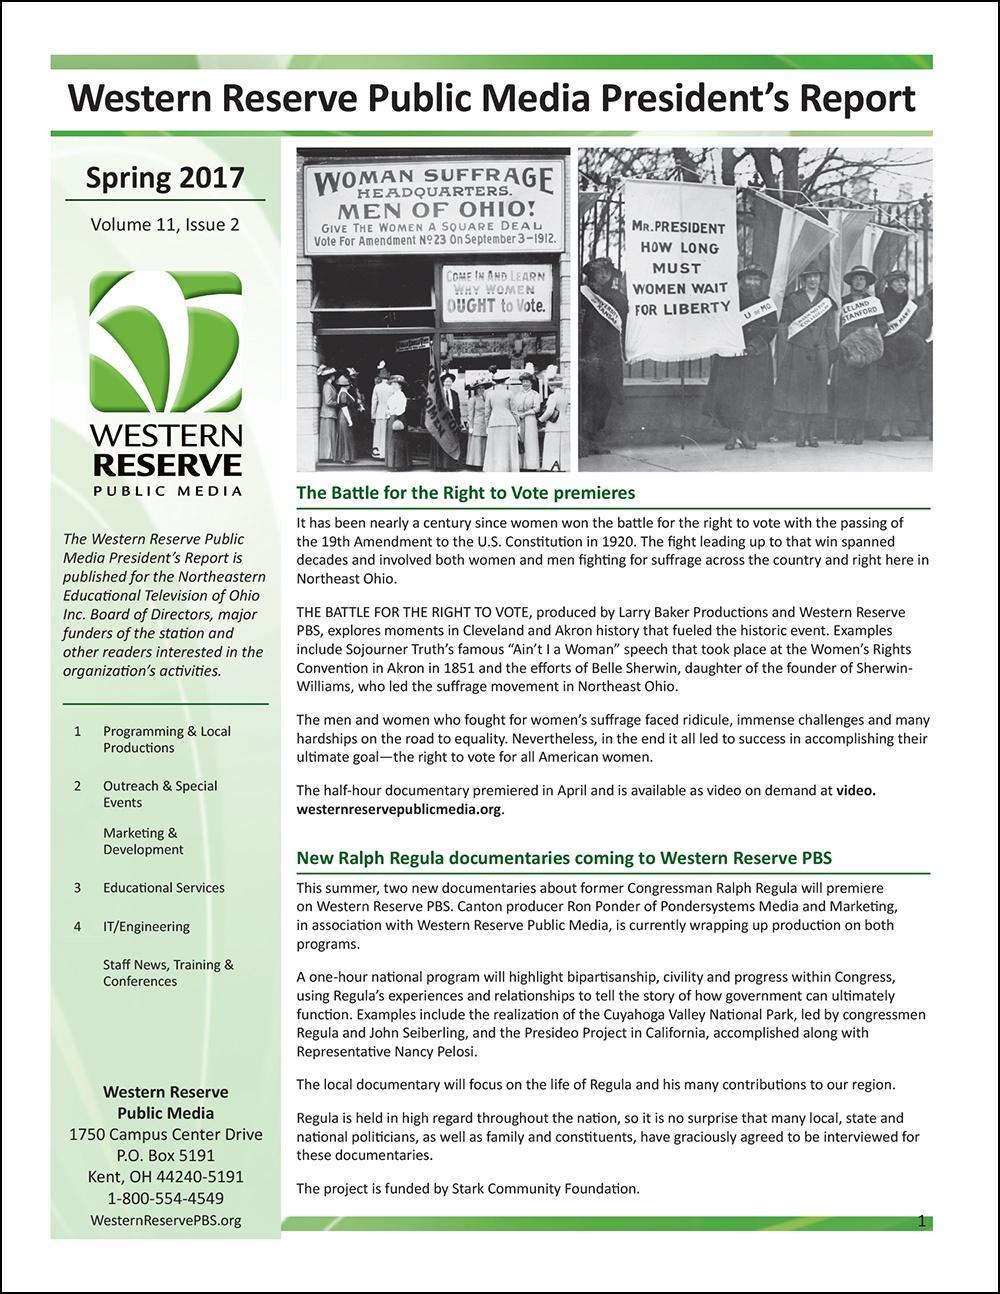 Spring 2017 - Volume 11, Issue 2